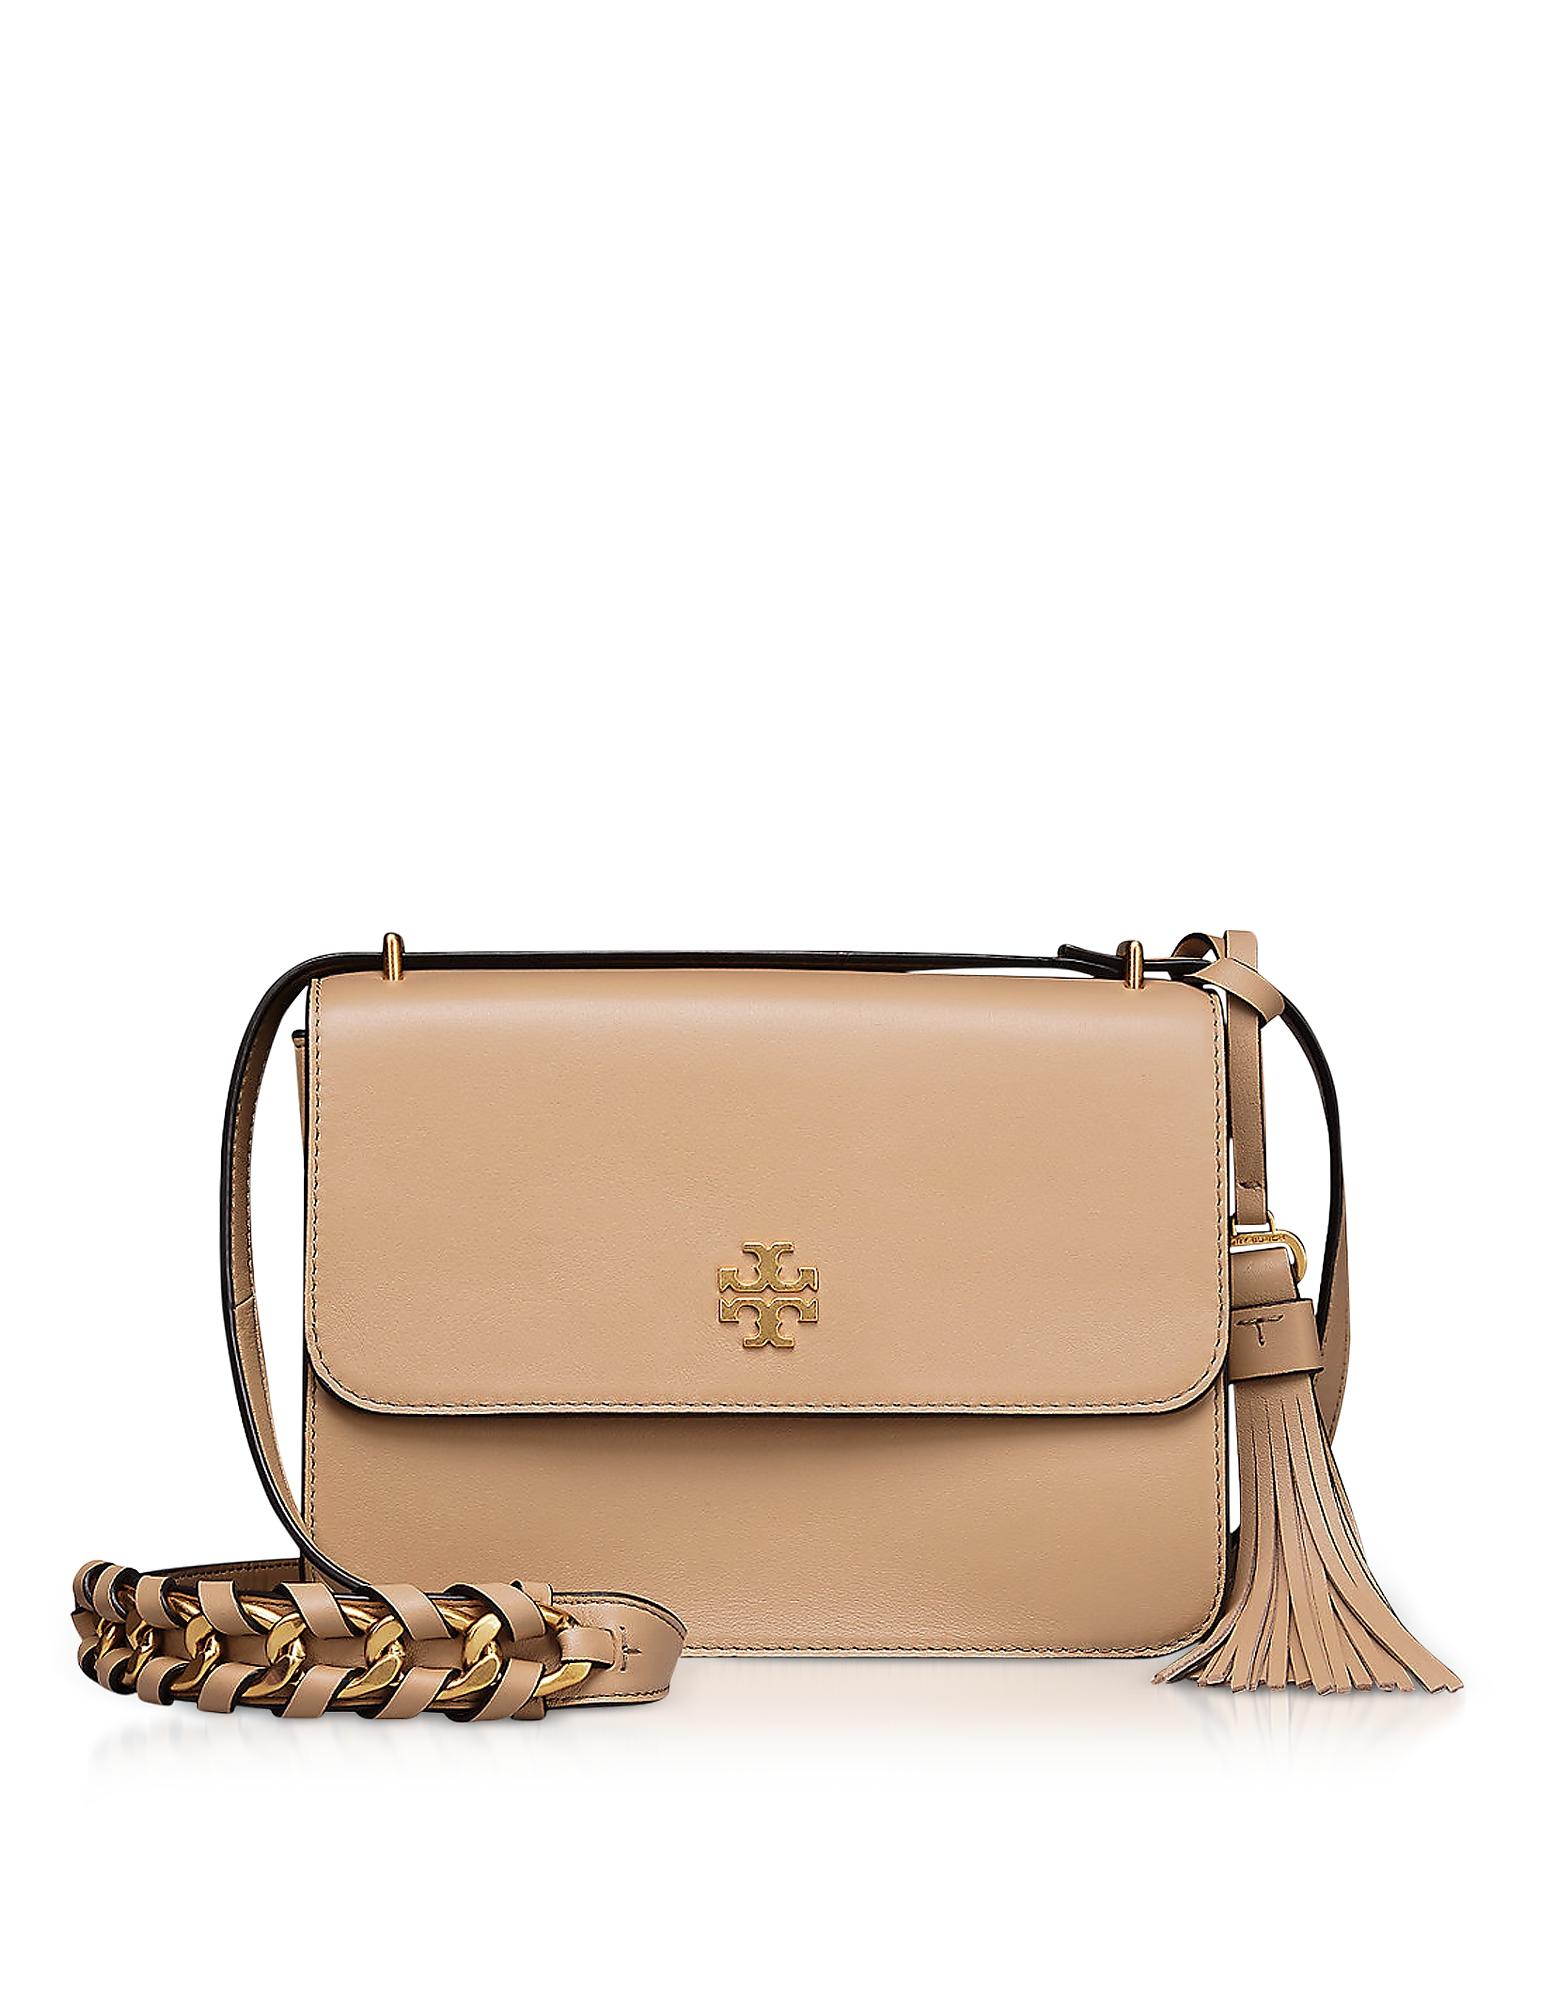 Tory Burch Handbags, Brooke Savannah Leather Shoulder Bag